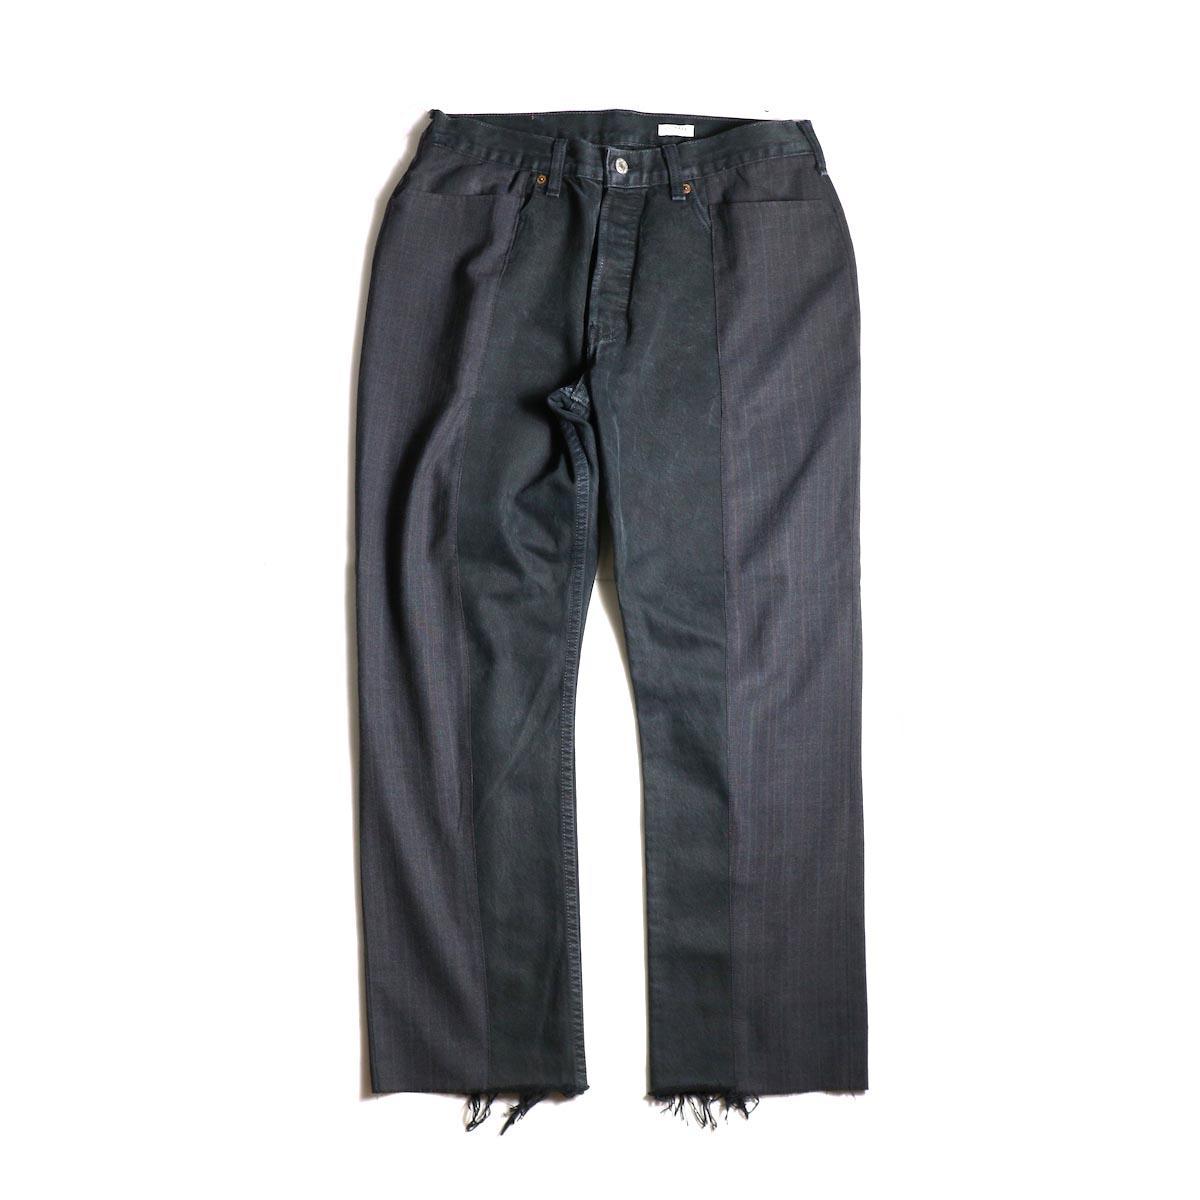 OLD PARK / Docking Jeans Black (Msize-A)正面